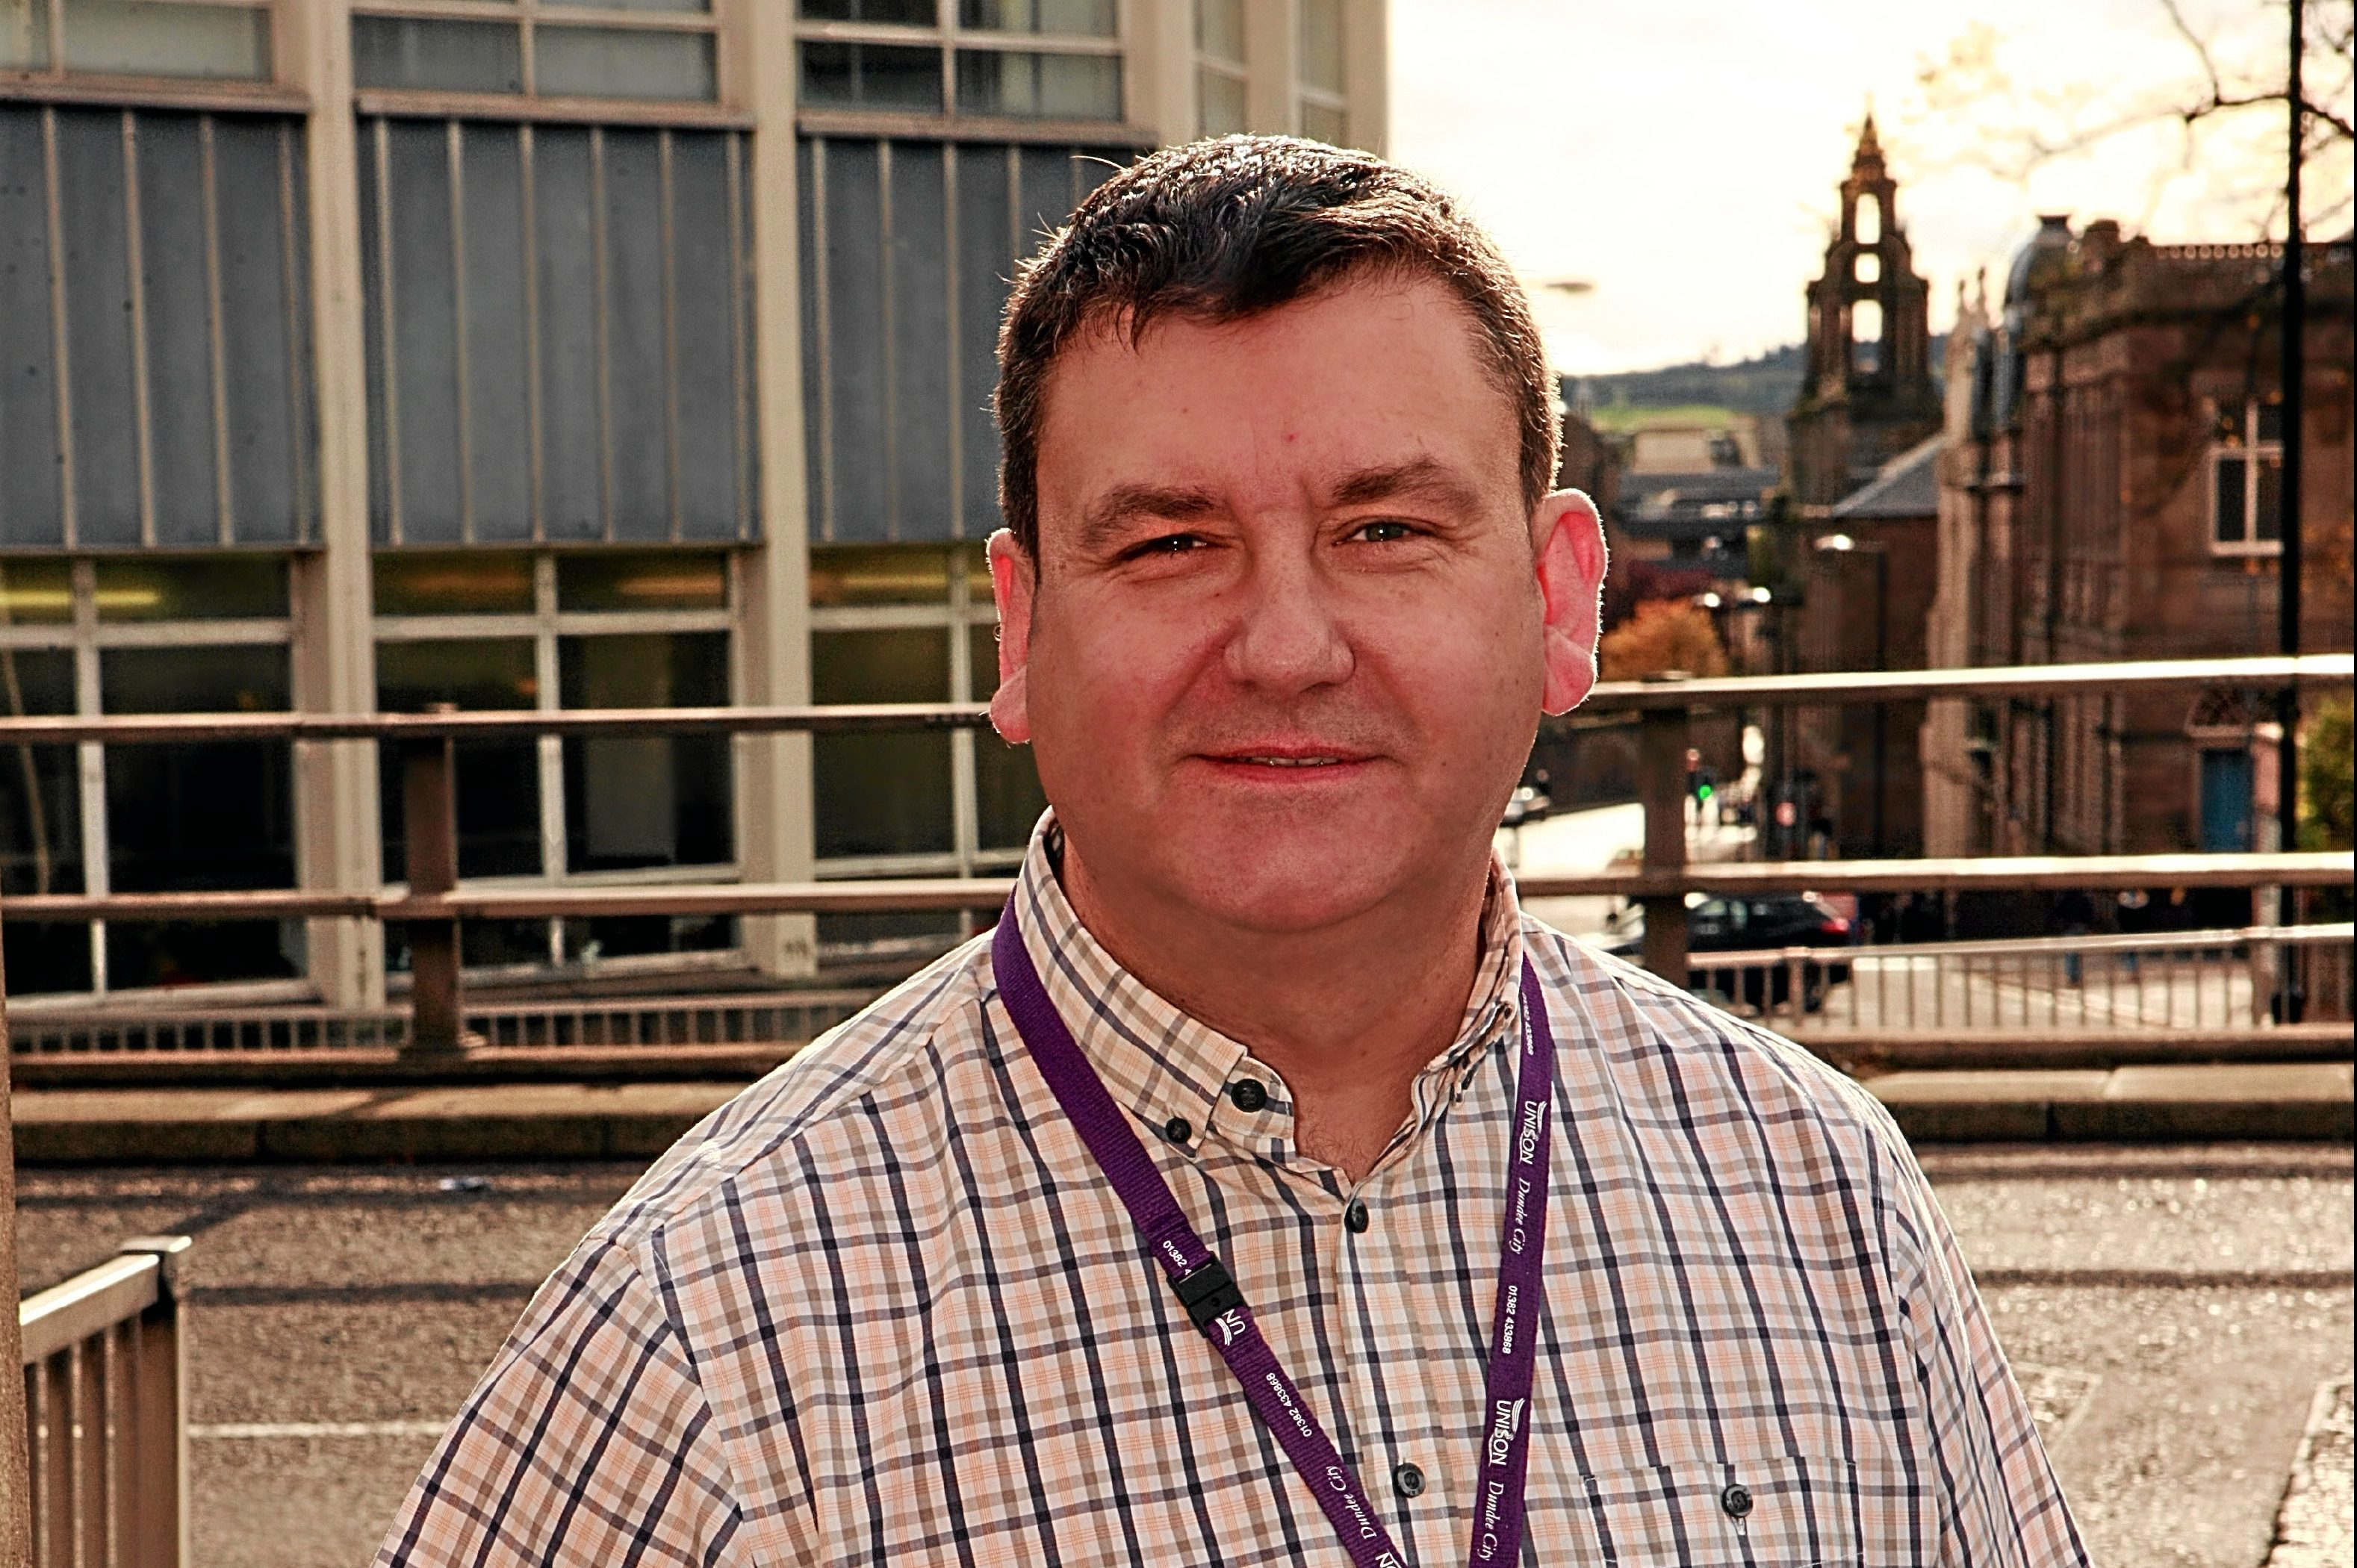 Jim McFarlane of Dundee's Unison